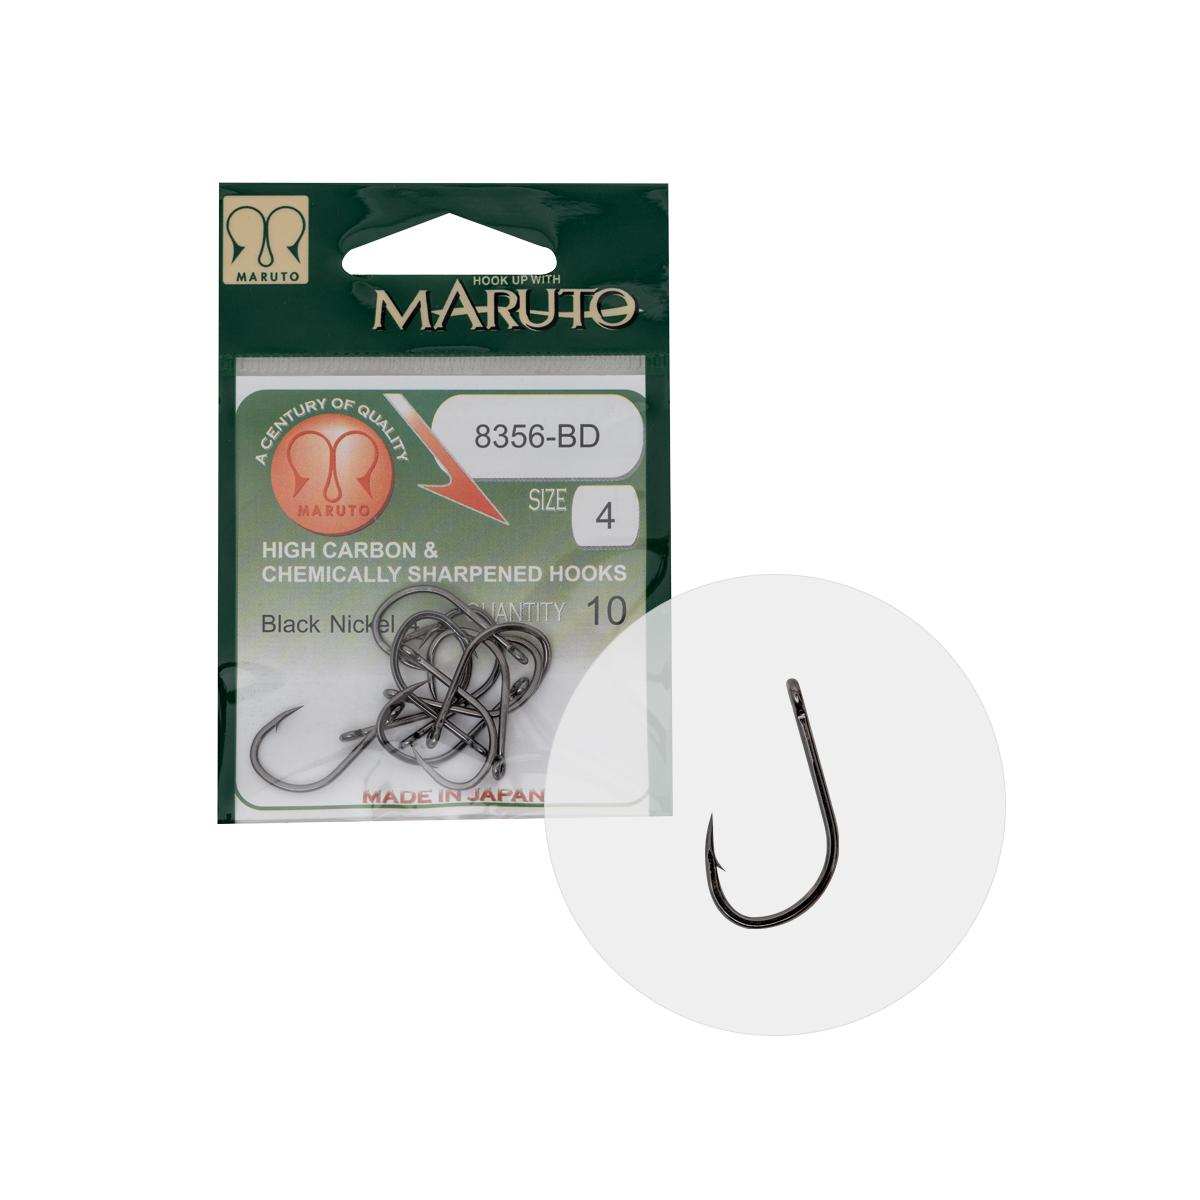 MARUTO HOROG 8356-BD CARP HOOKS BARBED FORGED STRAIGHT EYE HC  BLACK NICKEL 4